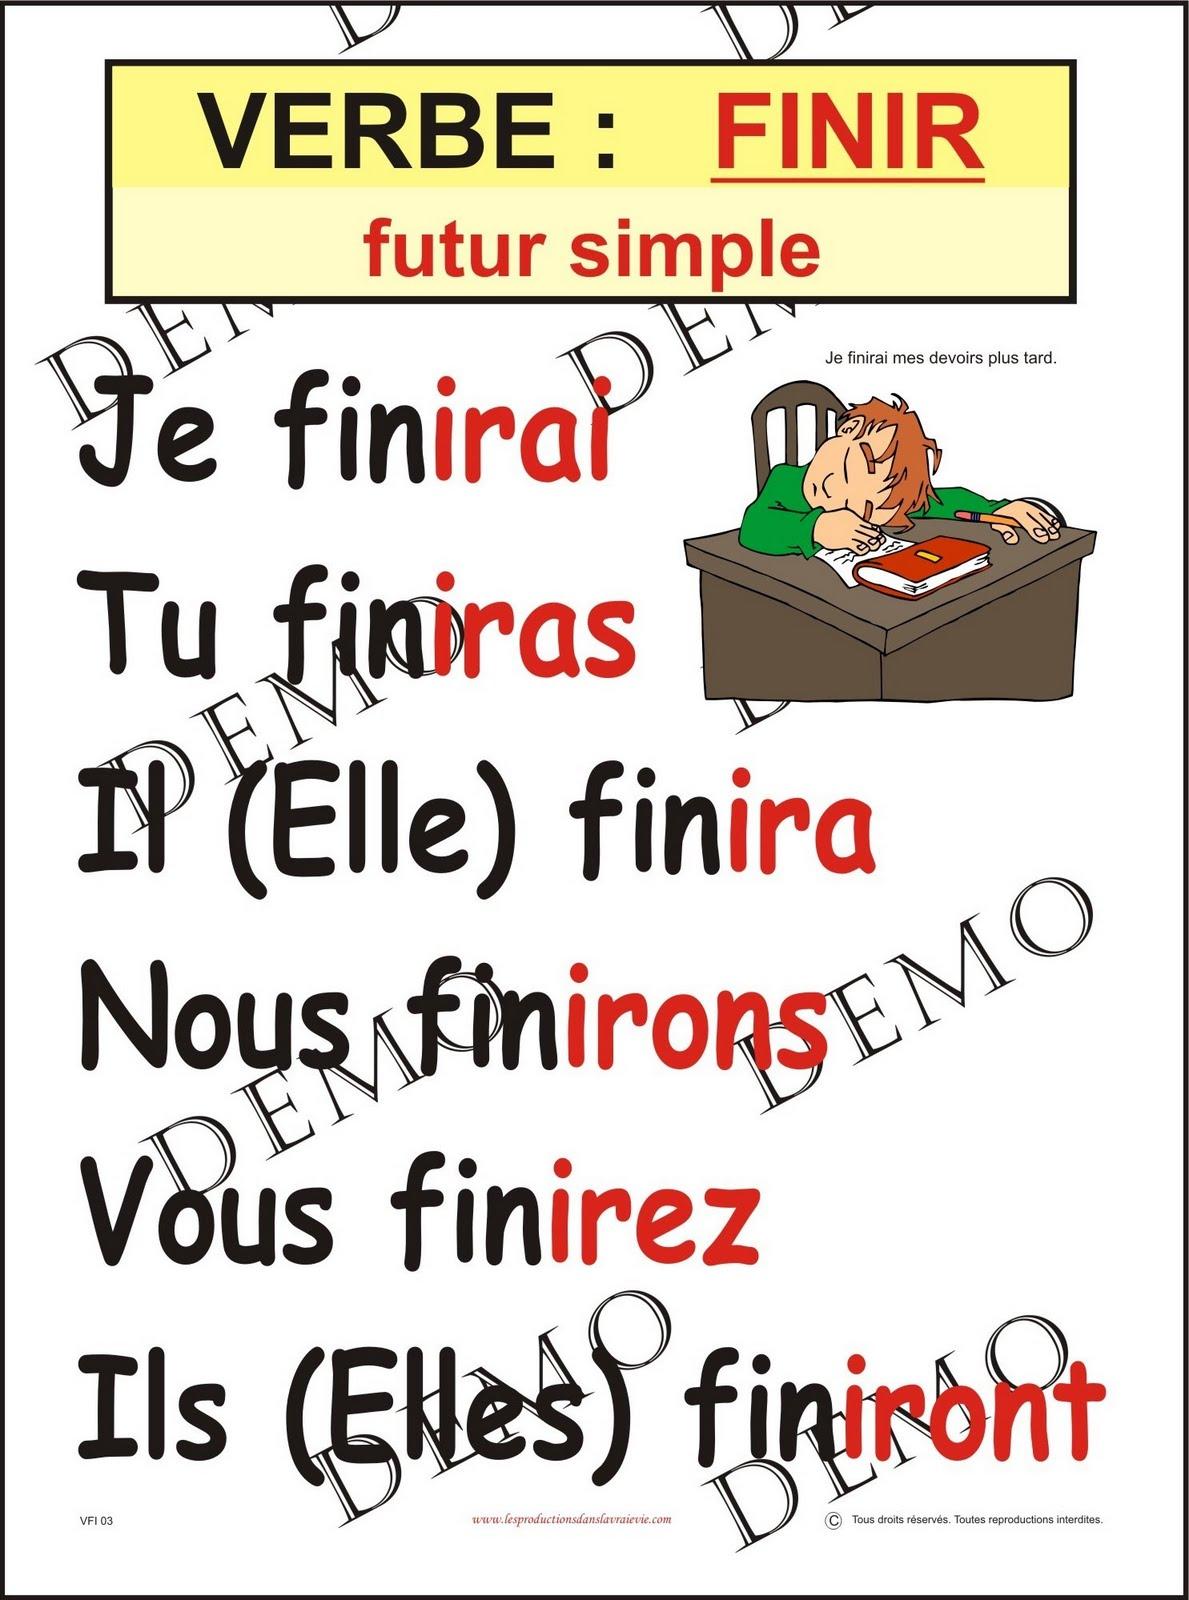 essayer futur simple l indicatif Essayer essayer simple futur au verbe comment conjuguer ce on pourra le conjuguer sur le verbe essayer futur simple l indicatif ont ¨ au futur simple.